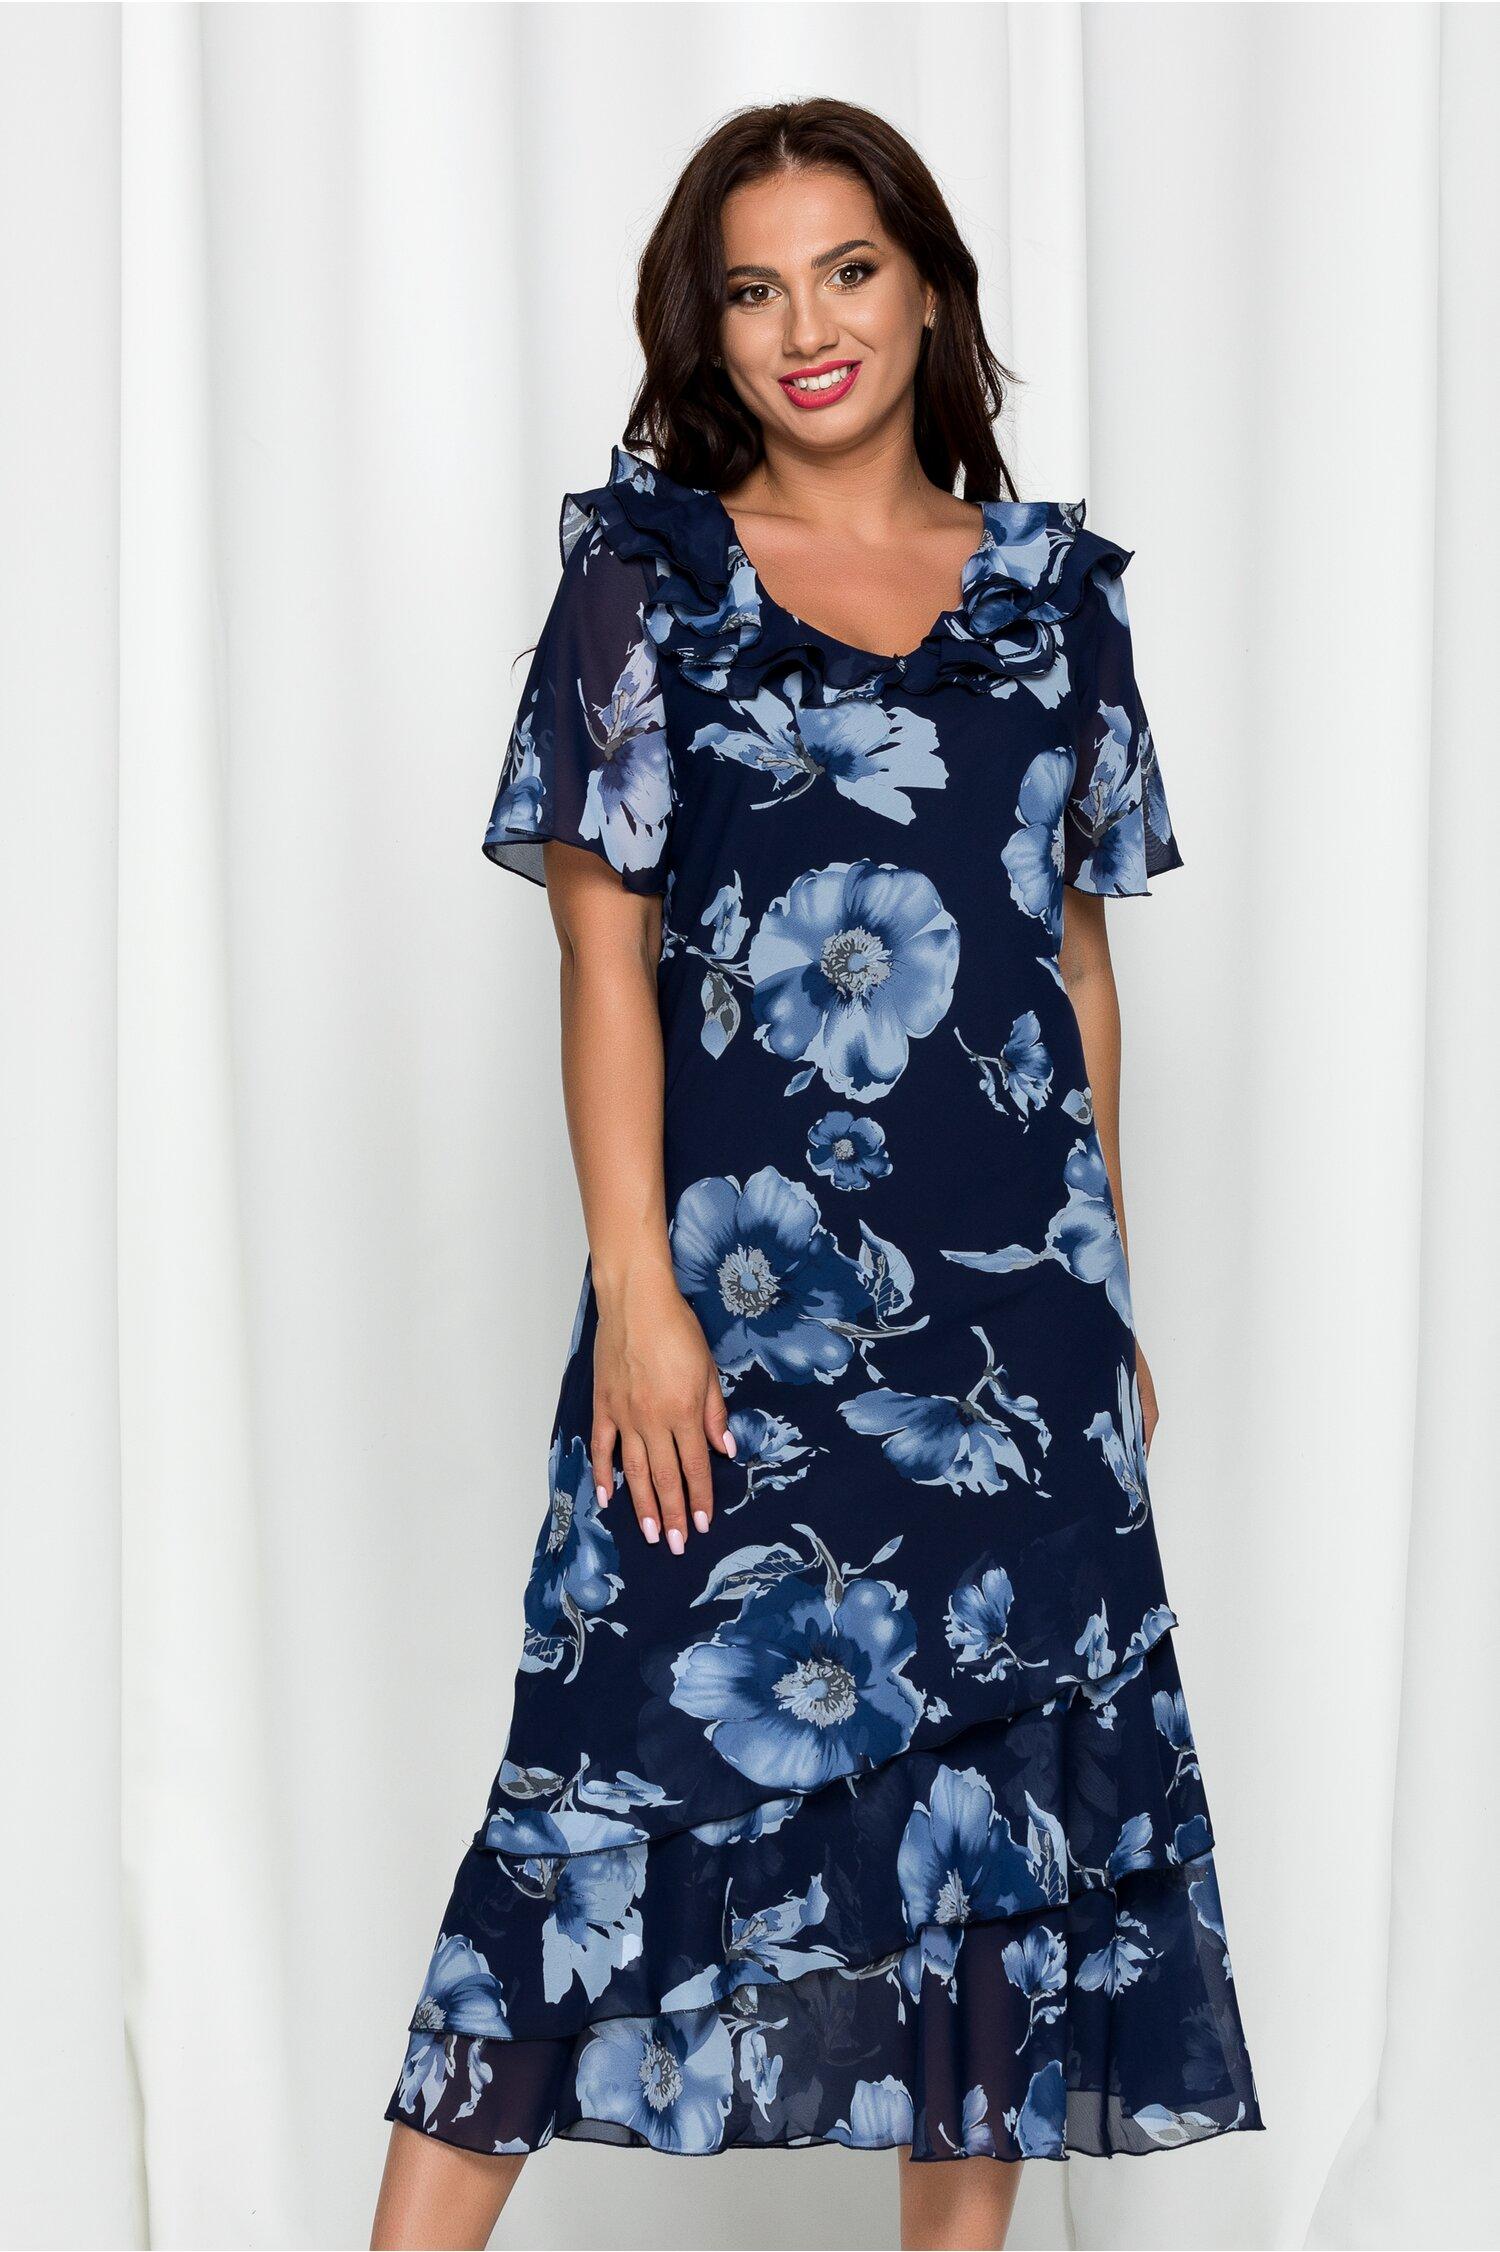 Rochie Raisa bleumarin cu imprimeu floral bleu si volanase